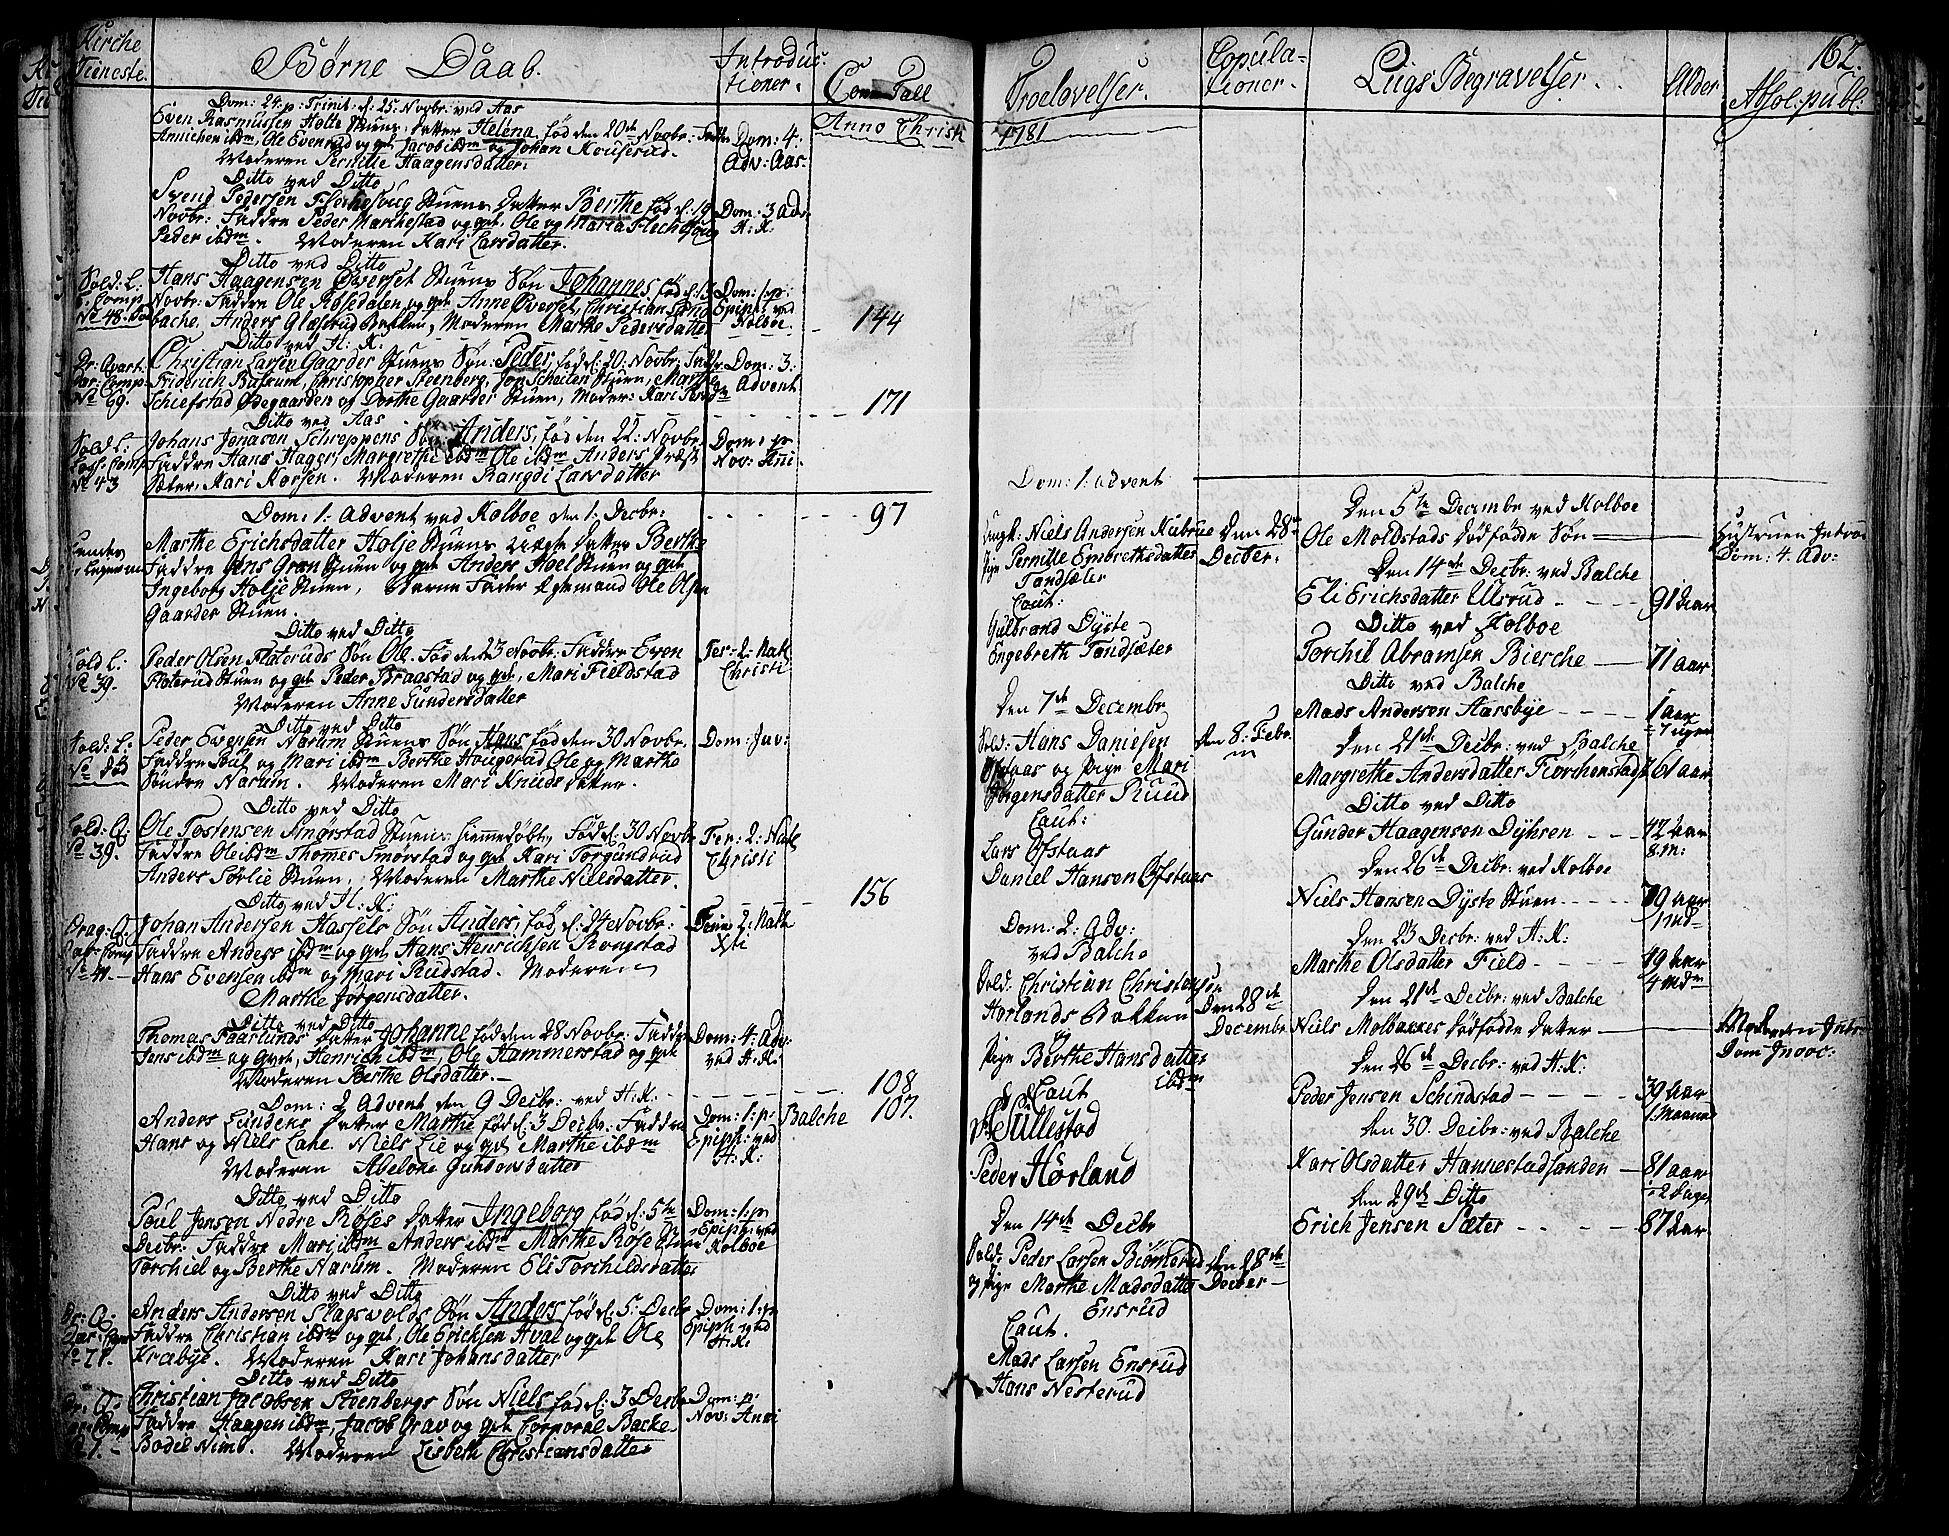 SAH, Toten prestekontor, Ministerialbok nr. 6, 1773-1793, s. 162